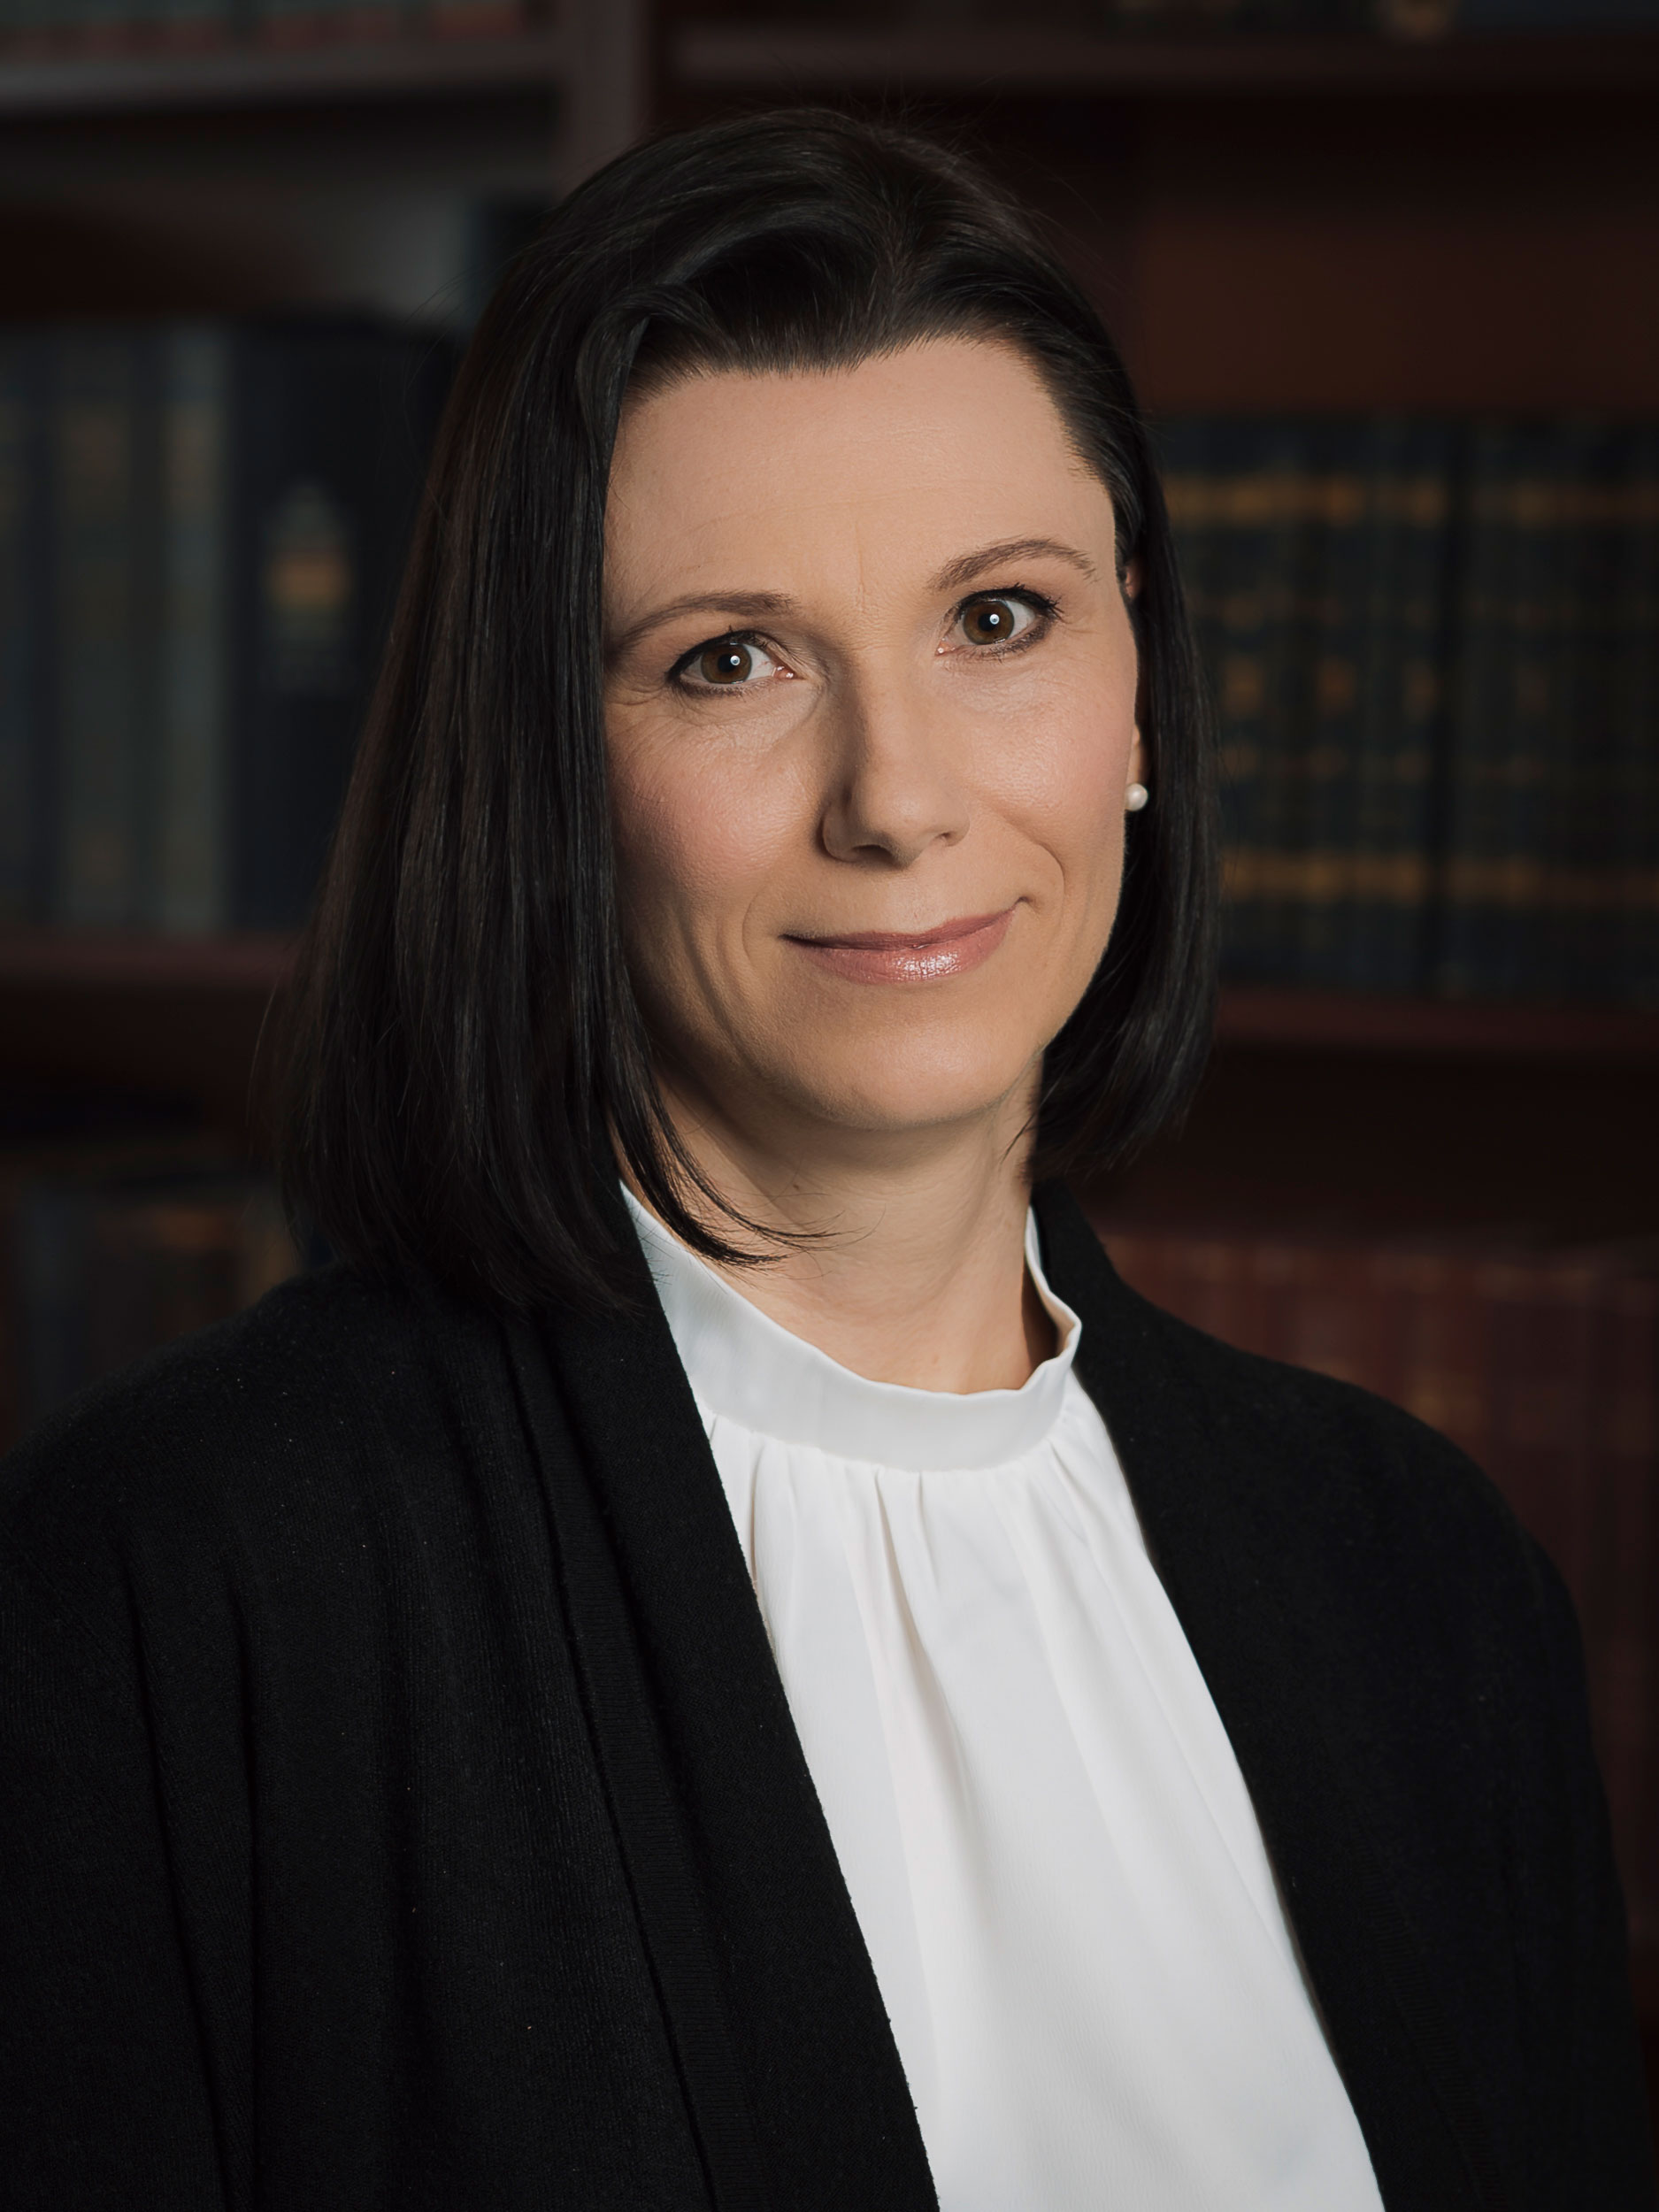 Katalin Tabasova